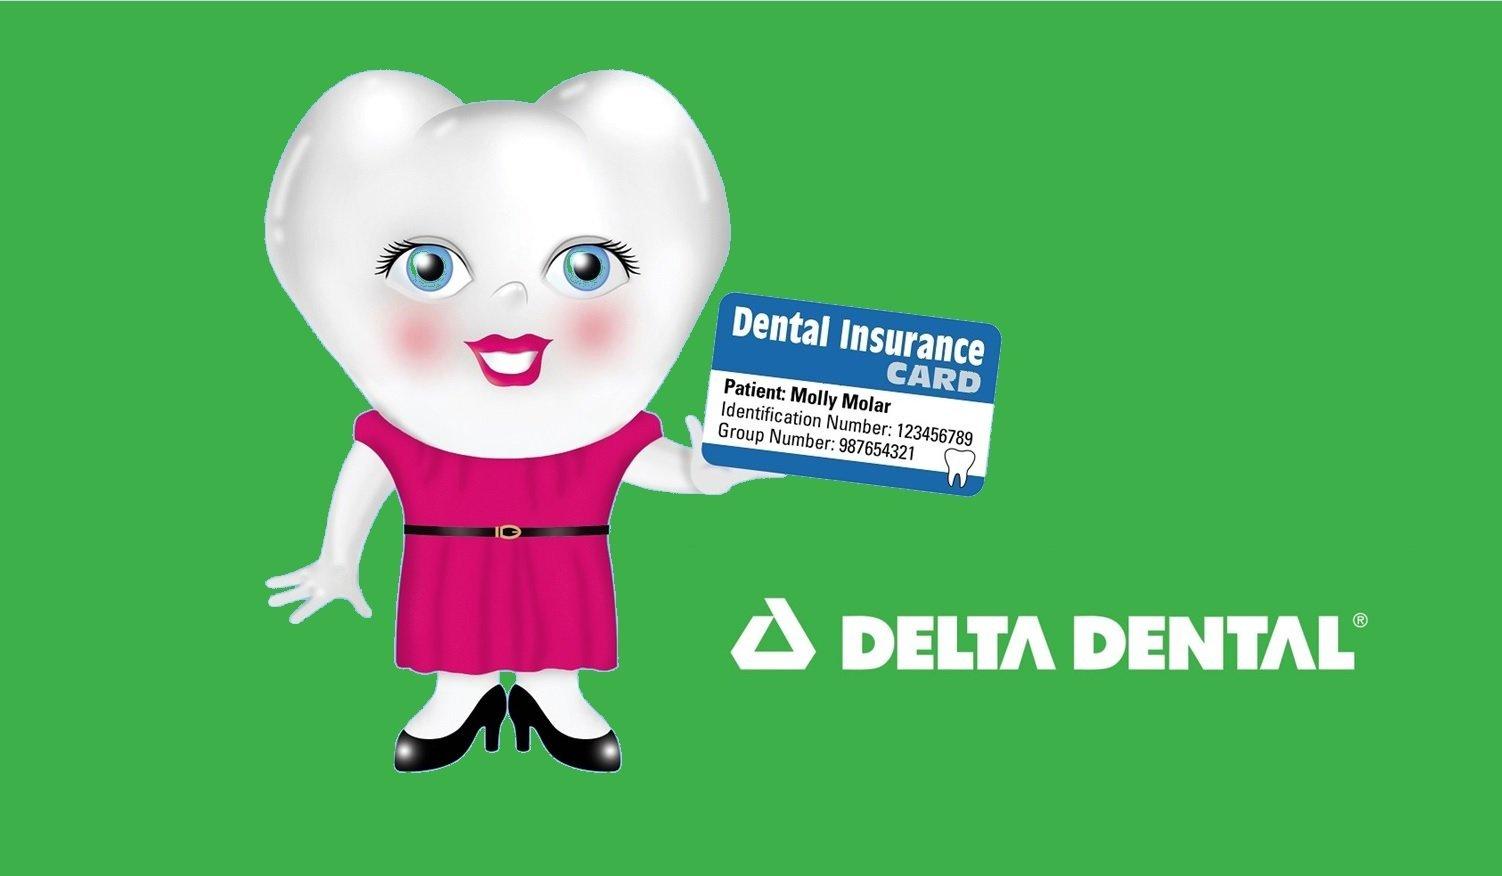 Delta Dental Insurance Provider in Akron and Canton, Ohio